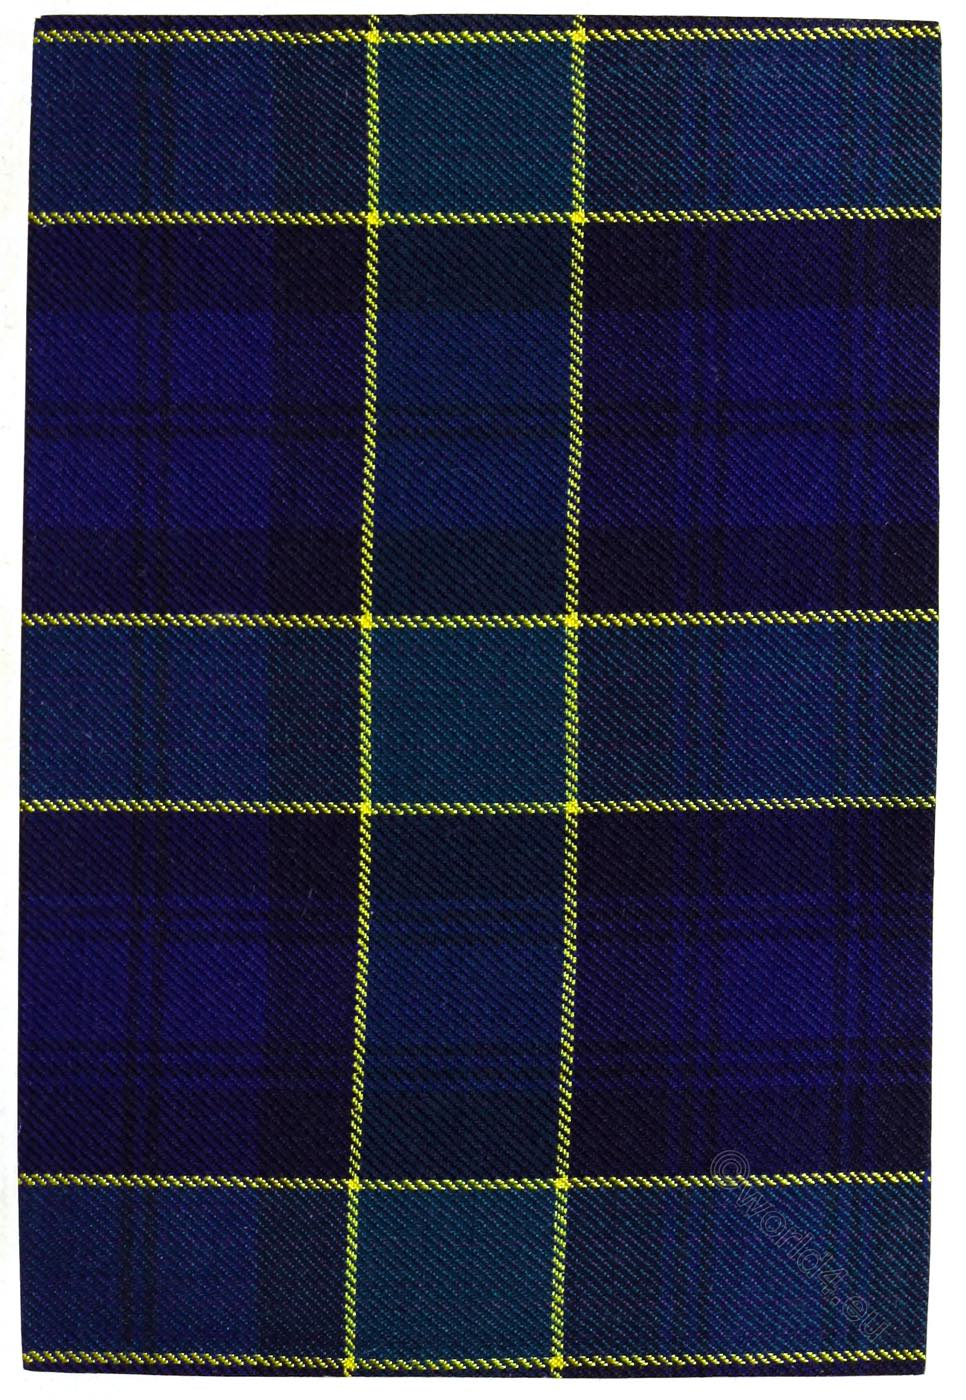 Tartan, Clan, Campbell, Breadalbane, Scottish, Pattern, Scotland,